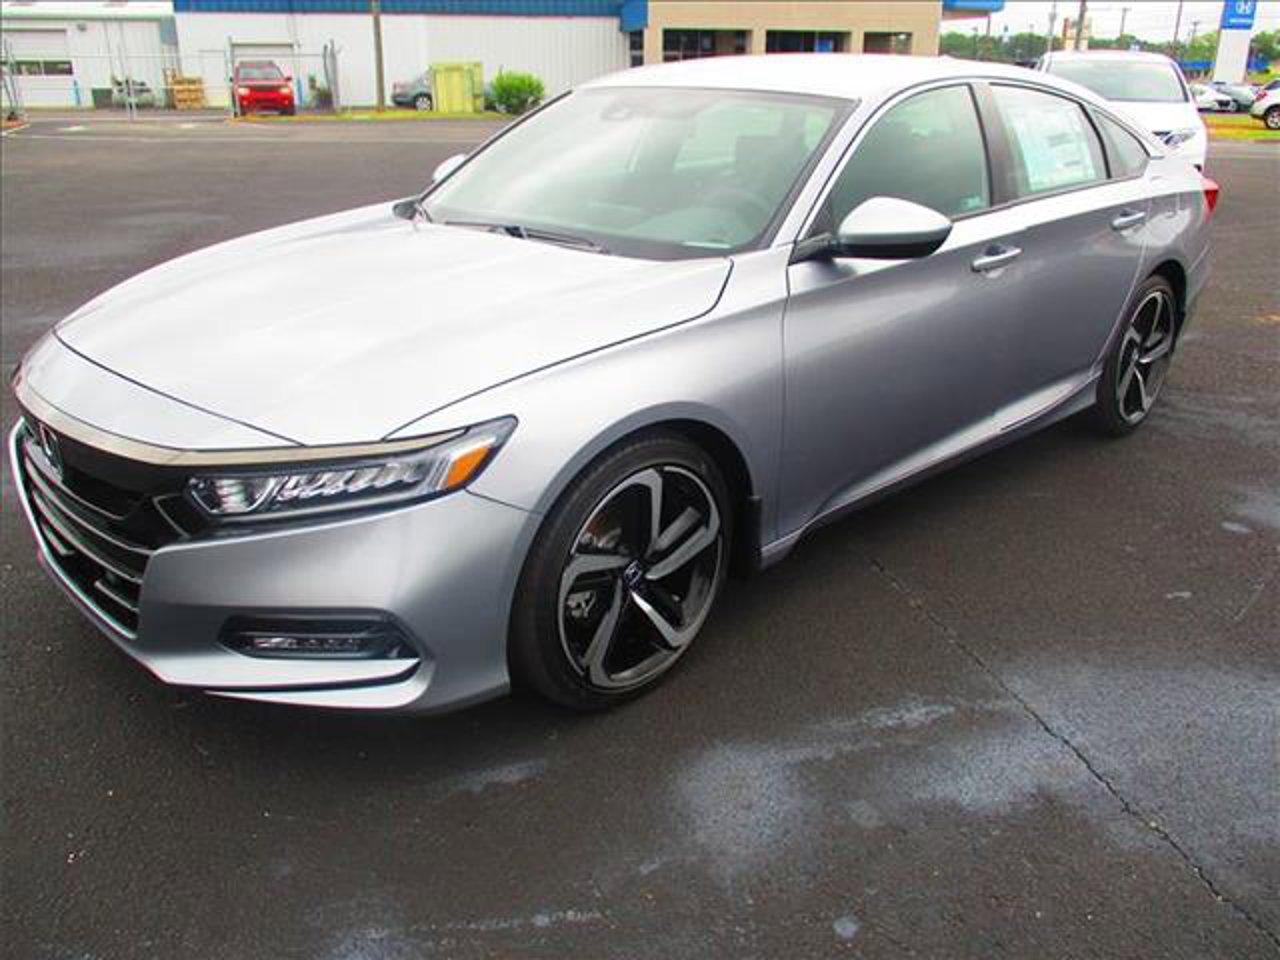 New 2020 Honda Accord Sedan in Dothan, AL